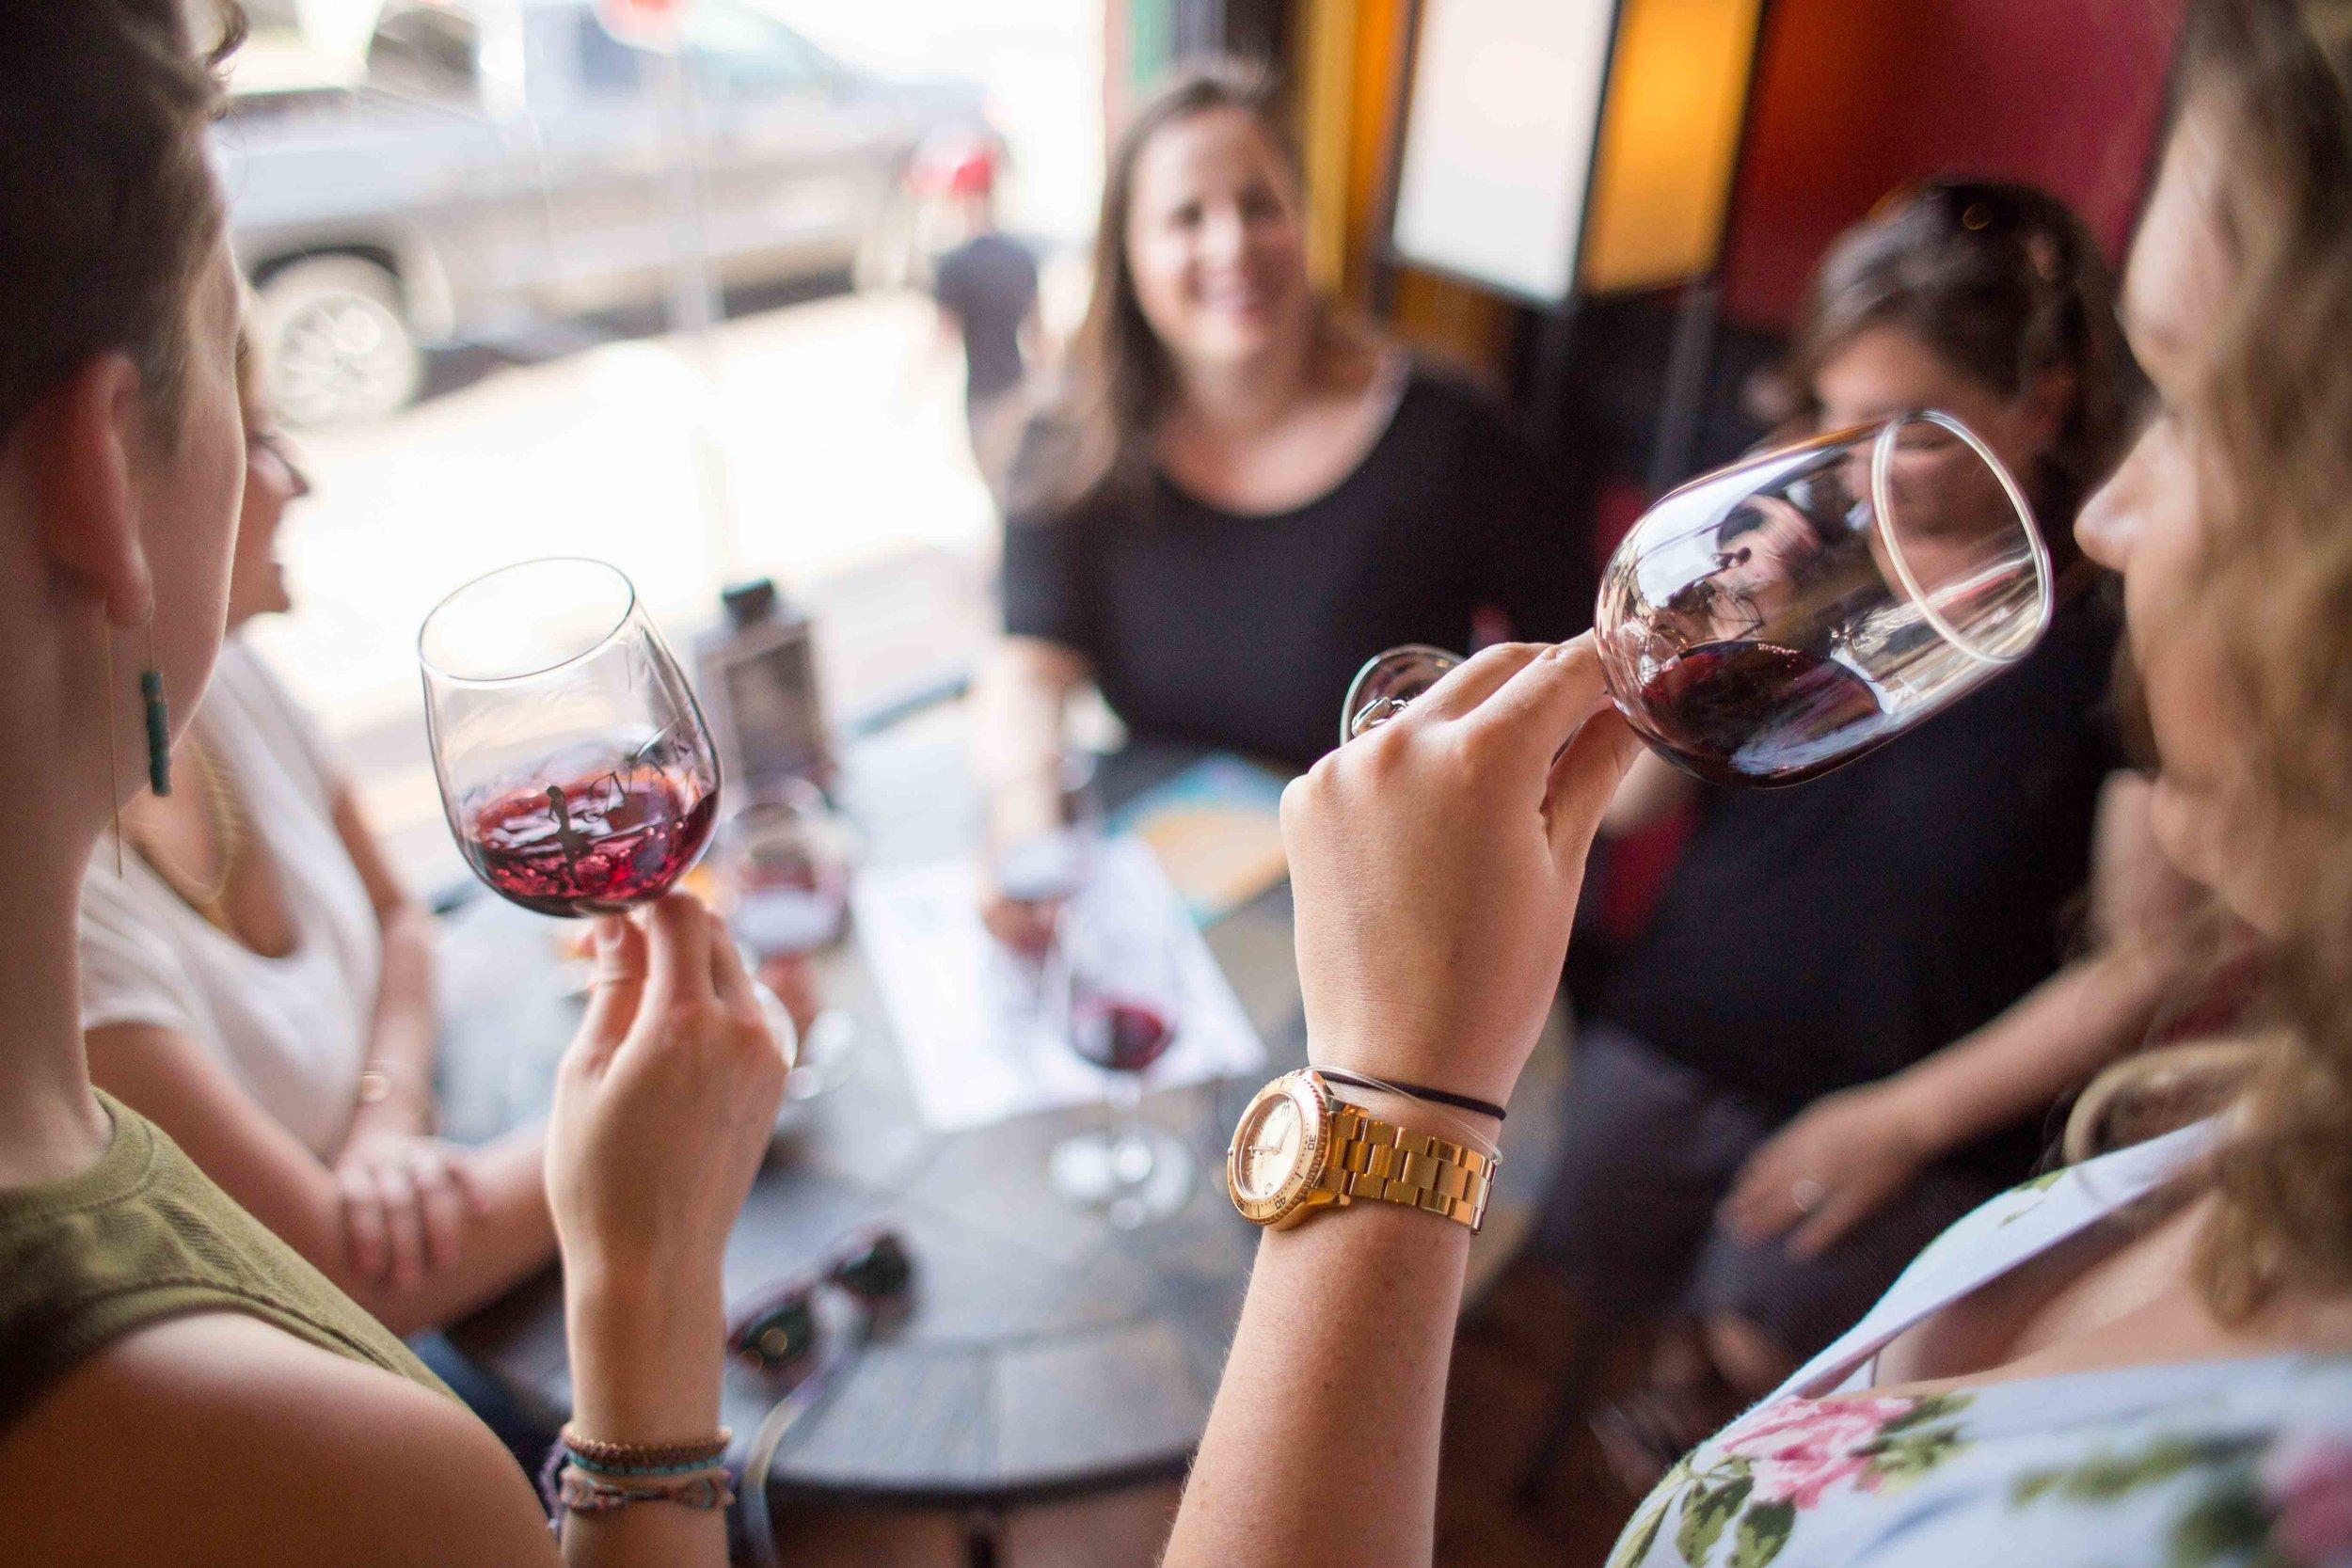 Hood River Wine Alliance Wine Walk Columbia Gorge Downtown Tasting Rooms Wineries Drink Taste Explore Columbia Gorge Oregon Washington-83.jpg